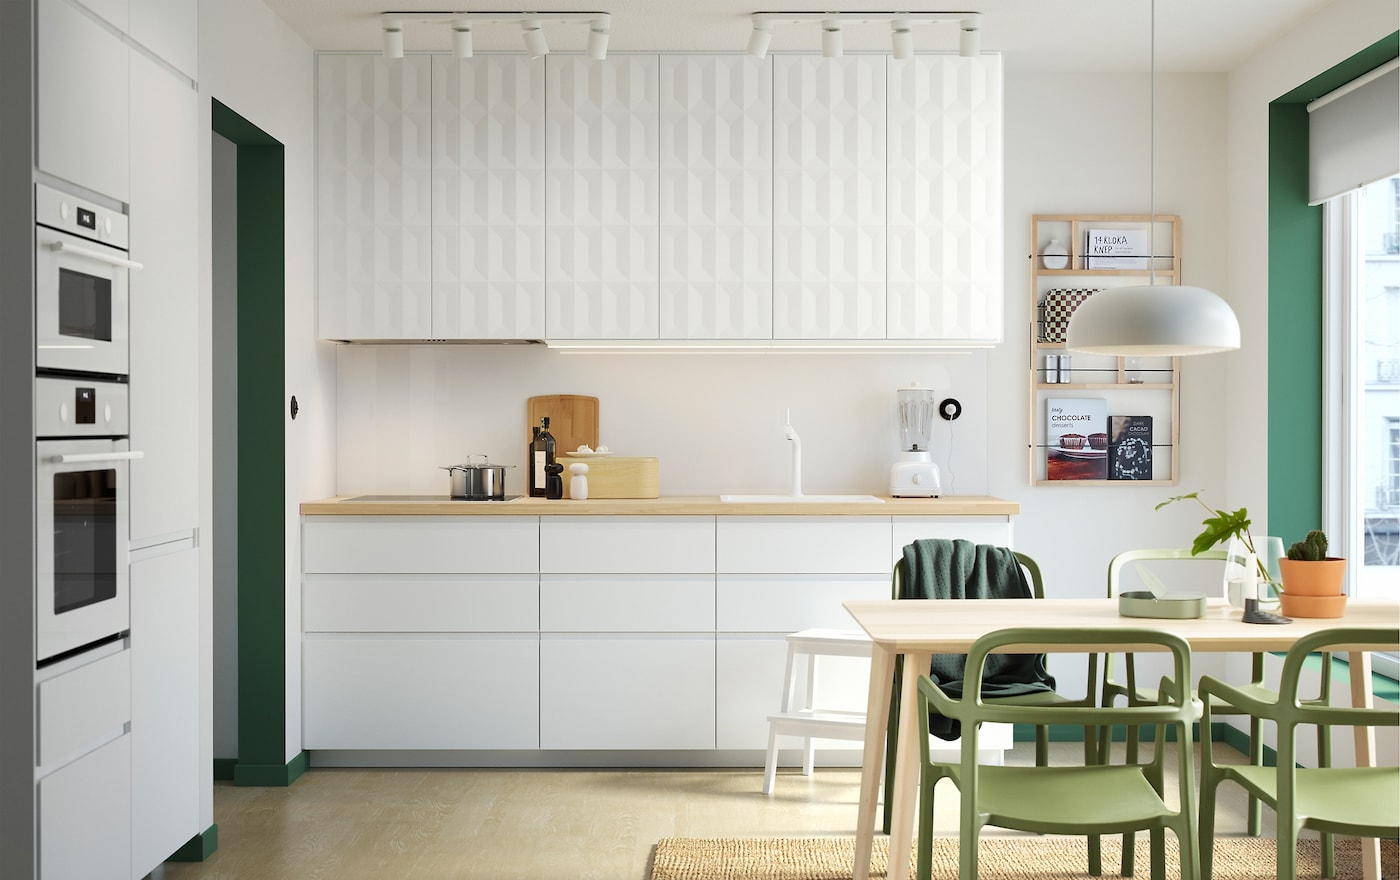 Ikea Dunstabzug Bejublad : Dunstabzugshaube ohne abluft kochinsel unterbau schlauch ikea